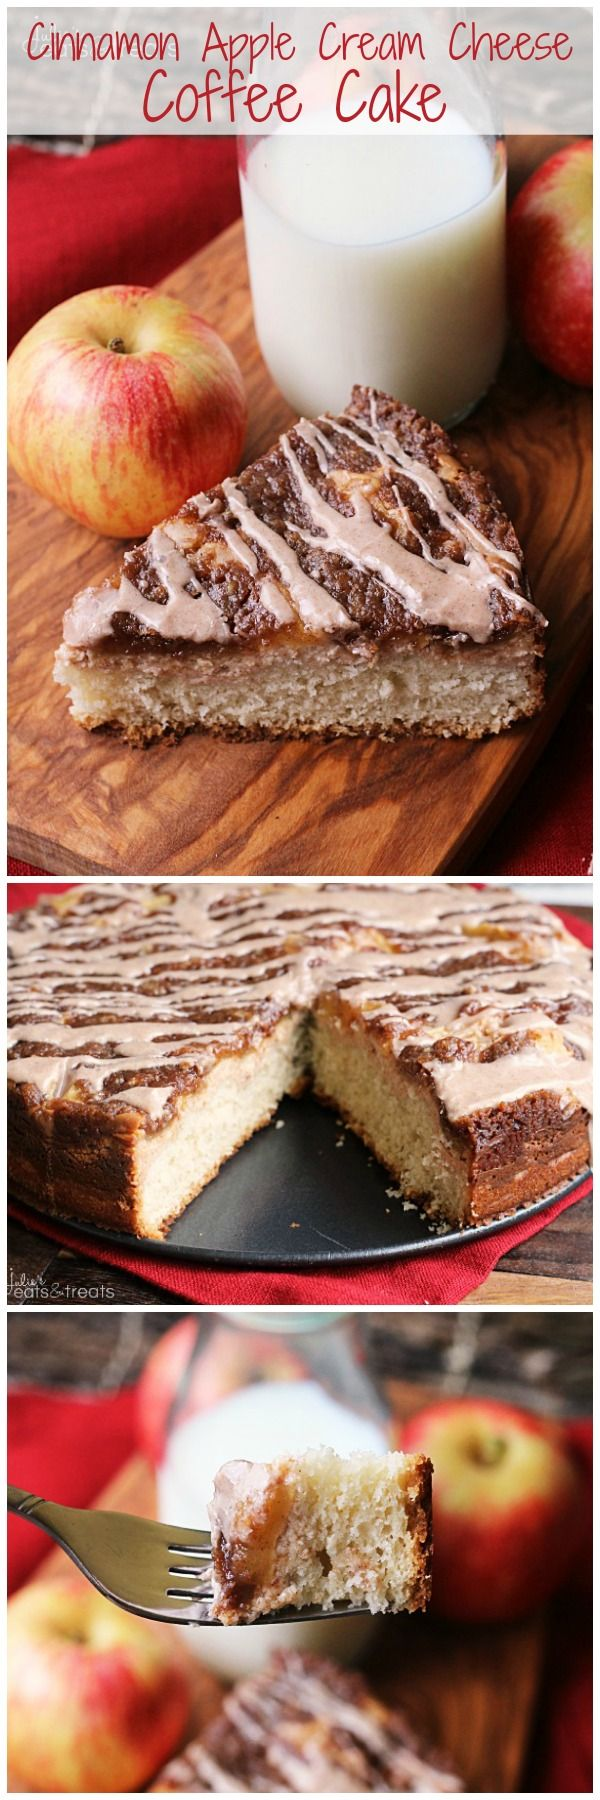 Cinnamon Apple Cream Cheese Coffee Cake | Cream Cheese ...